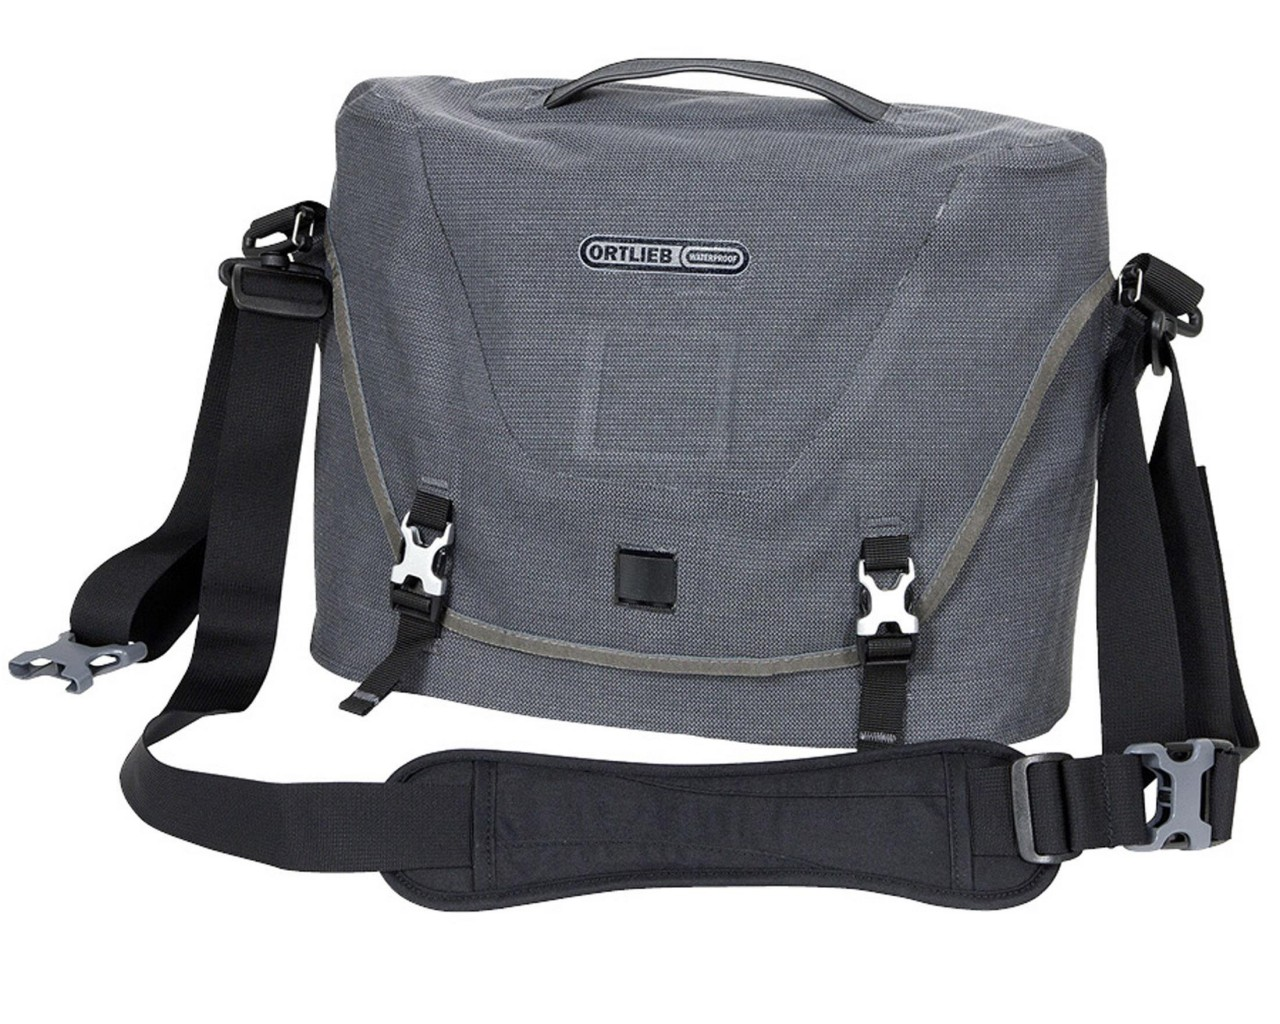 Ortlieb Courier-Bag waterproof shoulder bag | PVC-free - size M | pepper